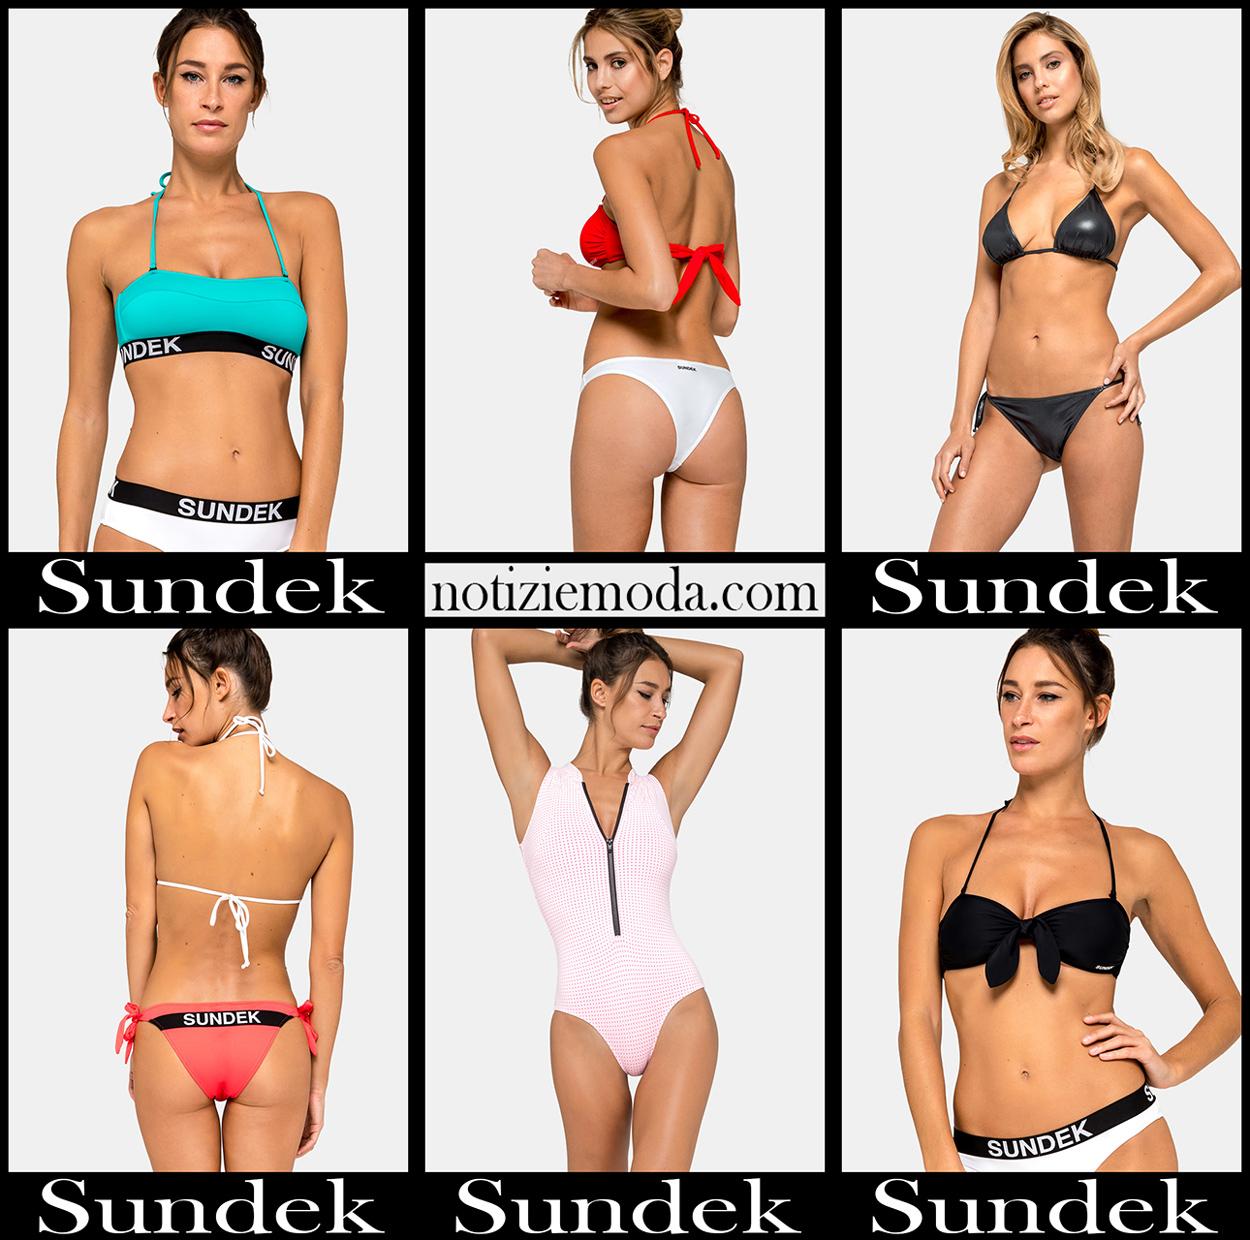 Bikini Sundek 2020 costumi da bagno donna accessori